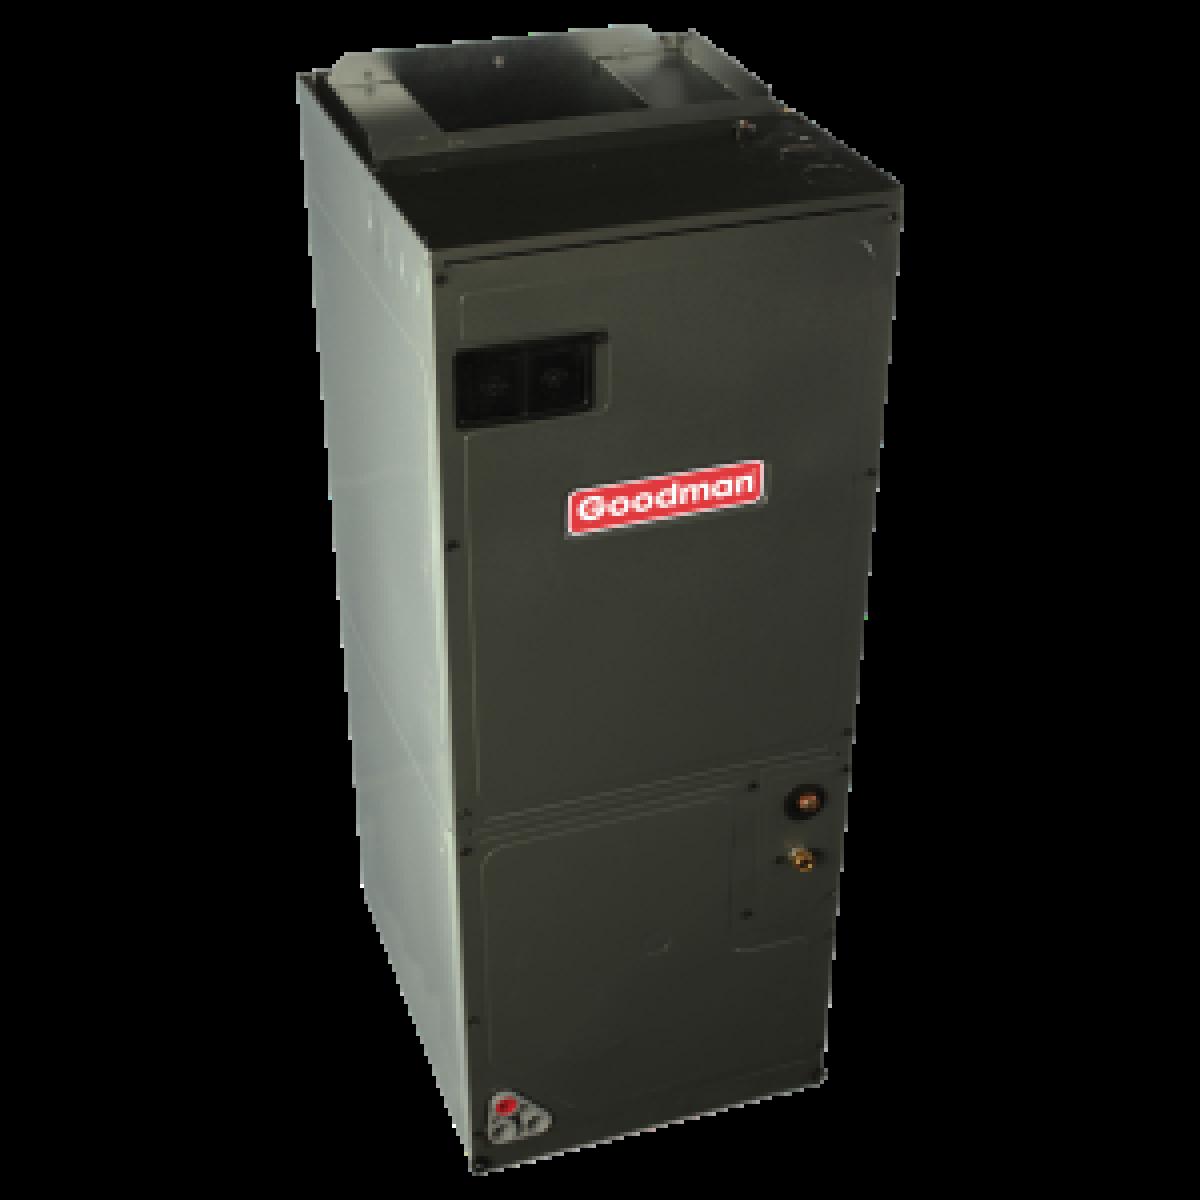 Goodman 3 5 Ton 15 Seer Heat Pump Split System 3 5 Ton